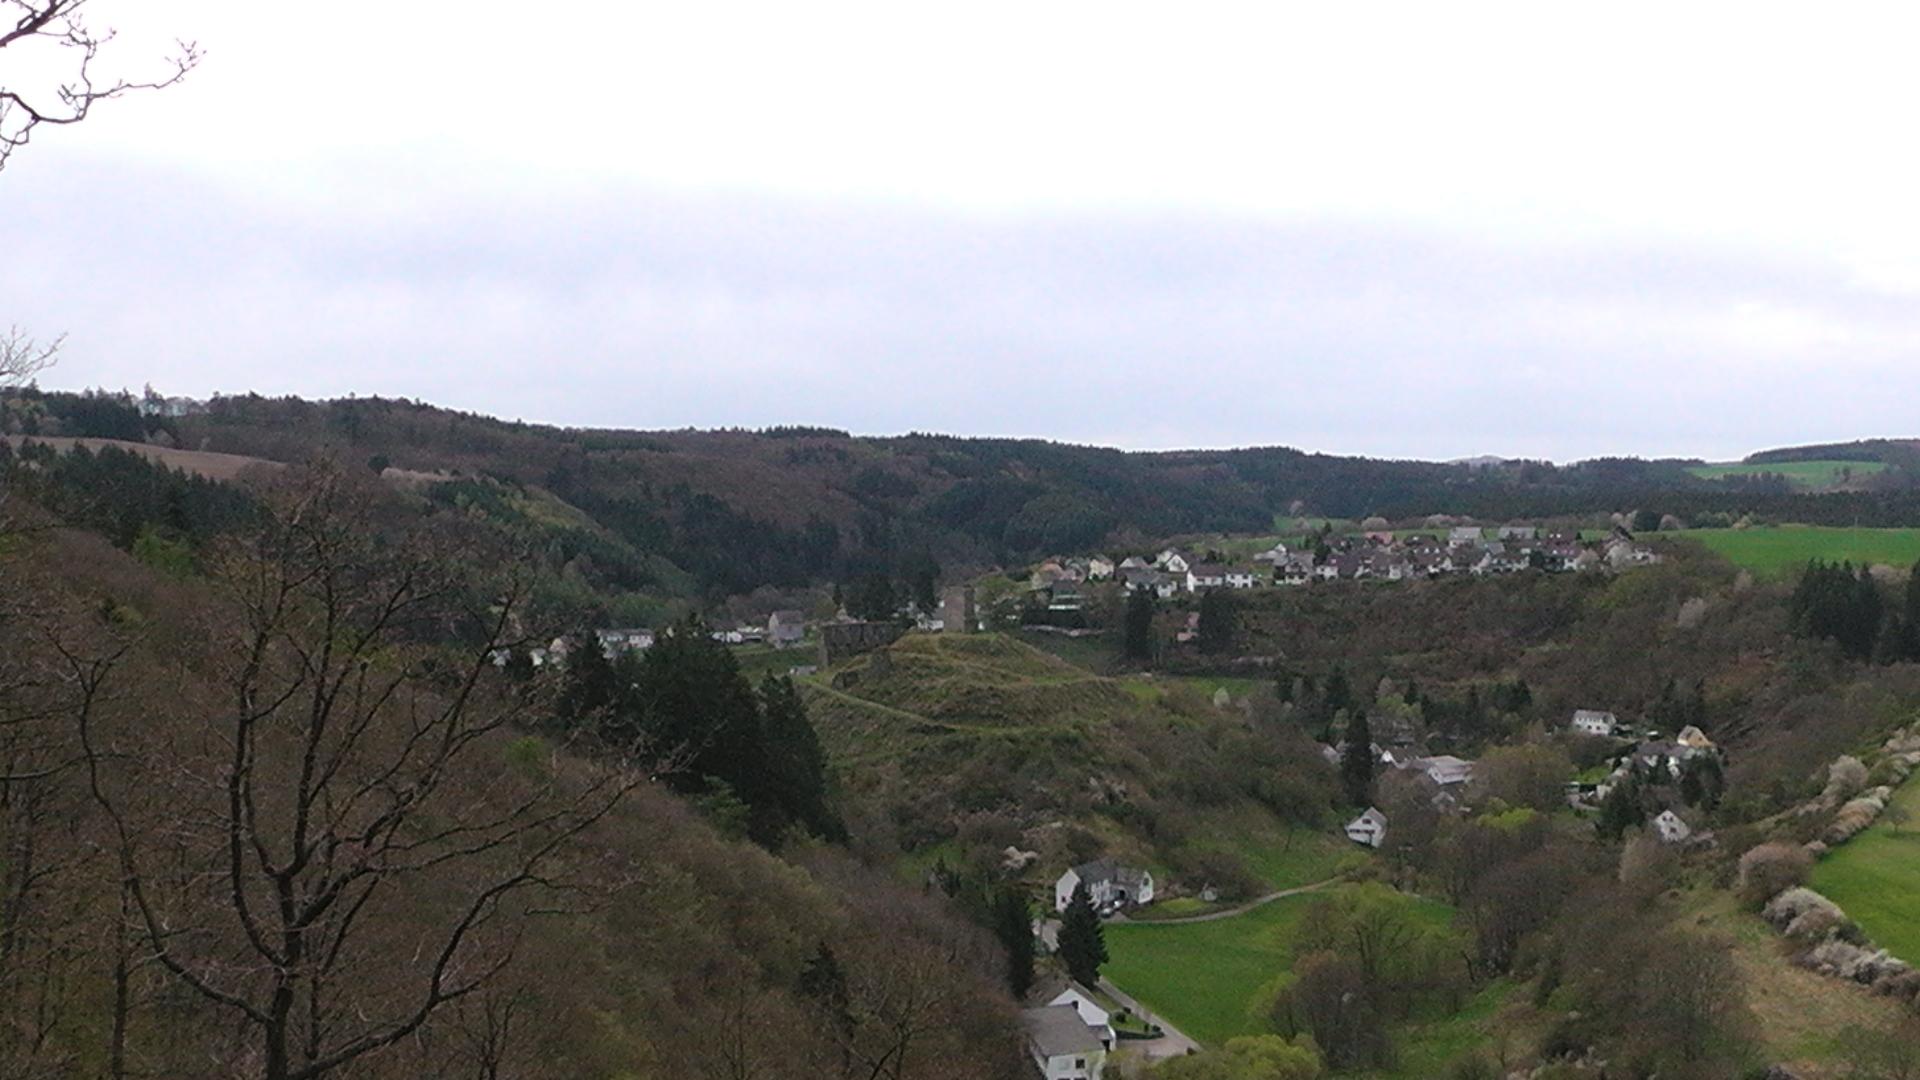 64-blick-auf-virneburg-vom-bergpfad